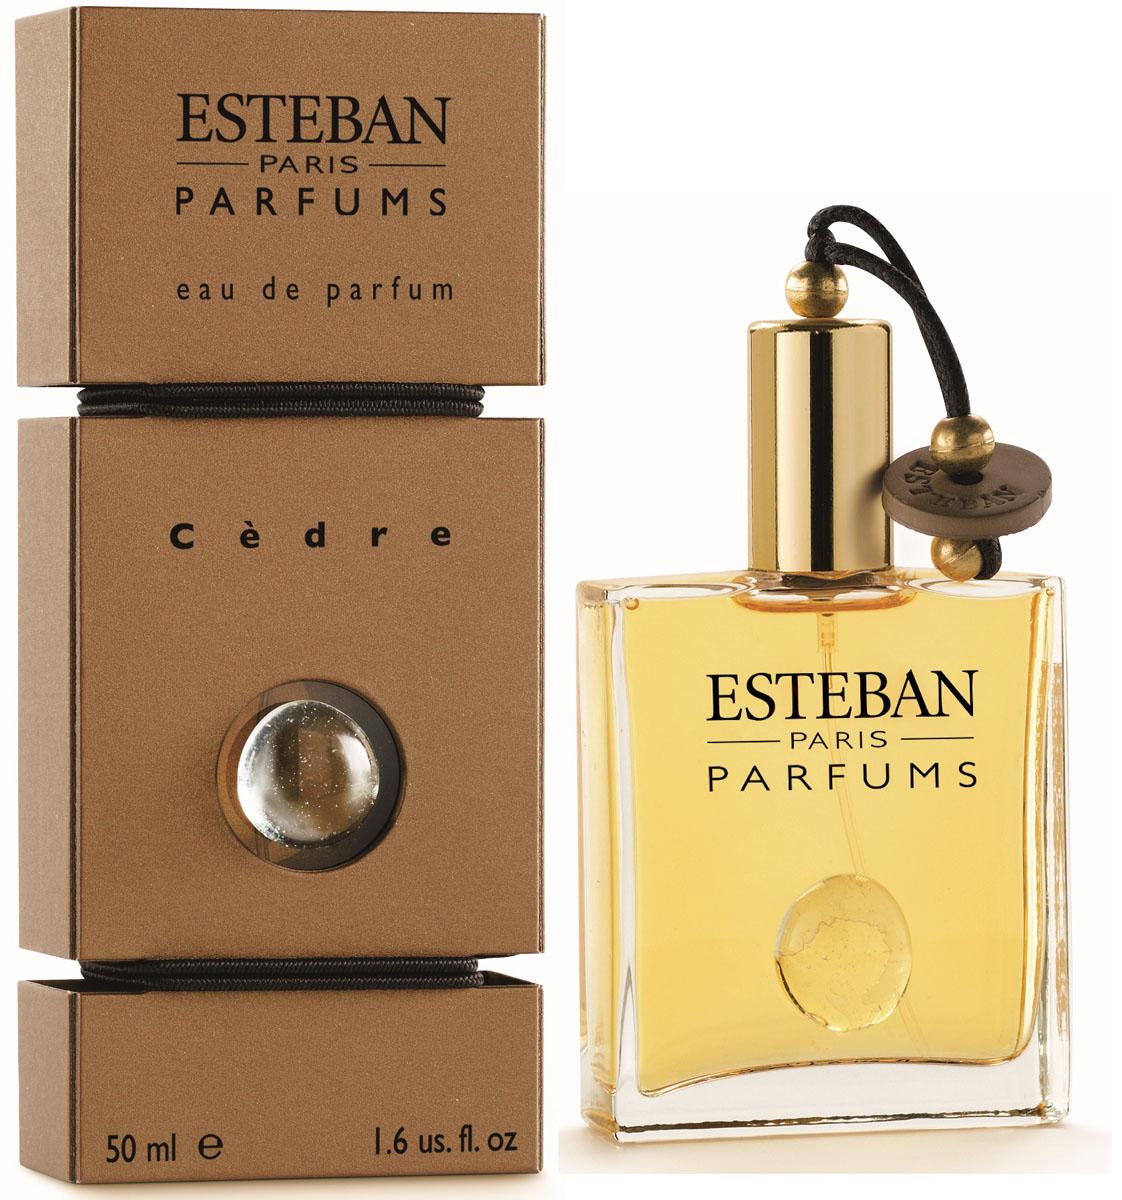 Esteban Collection Les Matieres Парфюмерная вода Cedre 50 млCPA-019